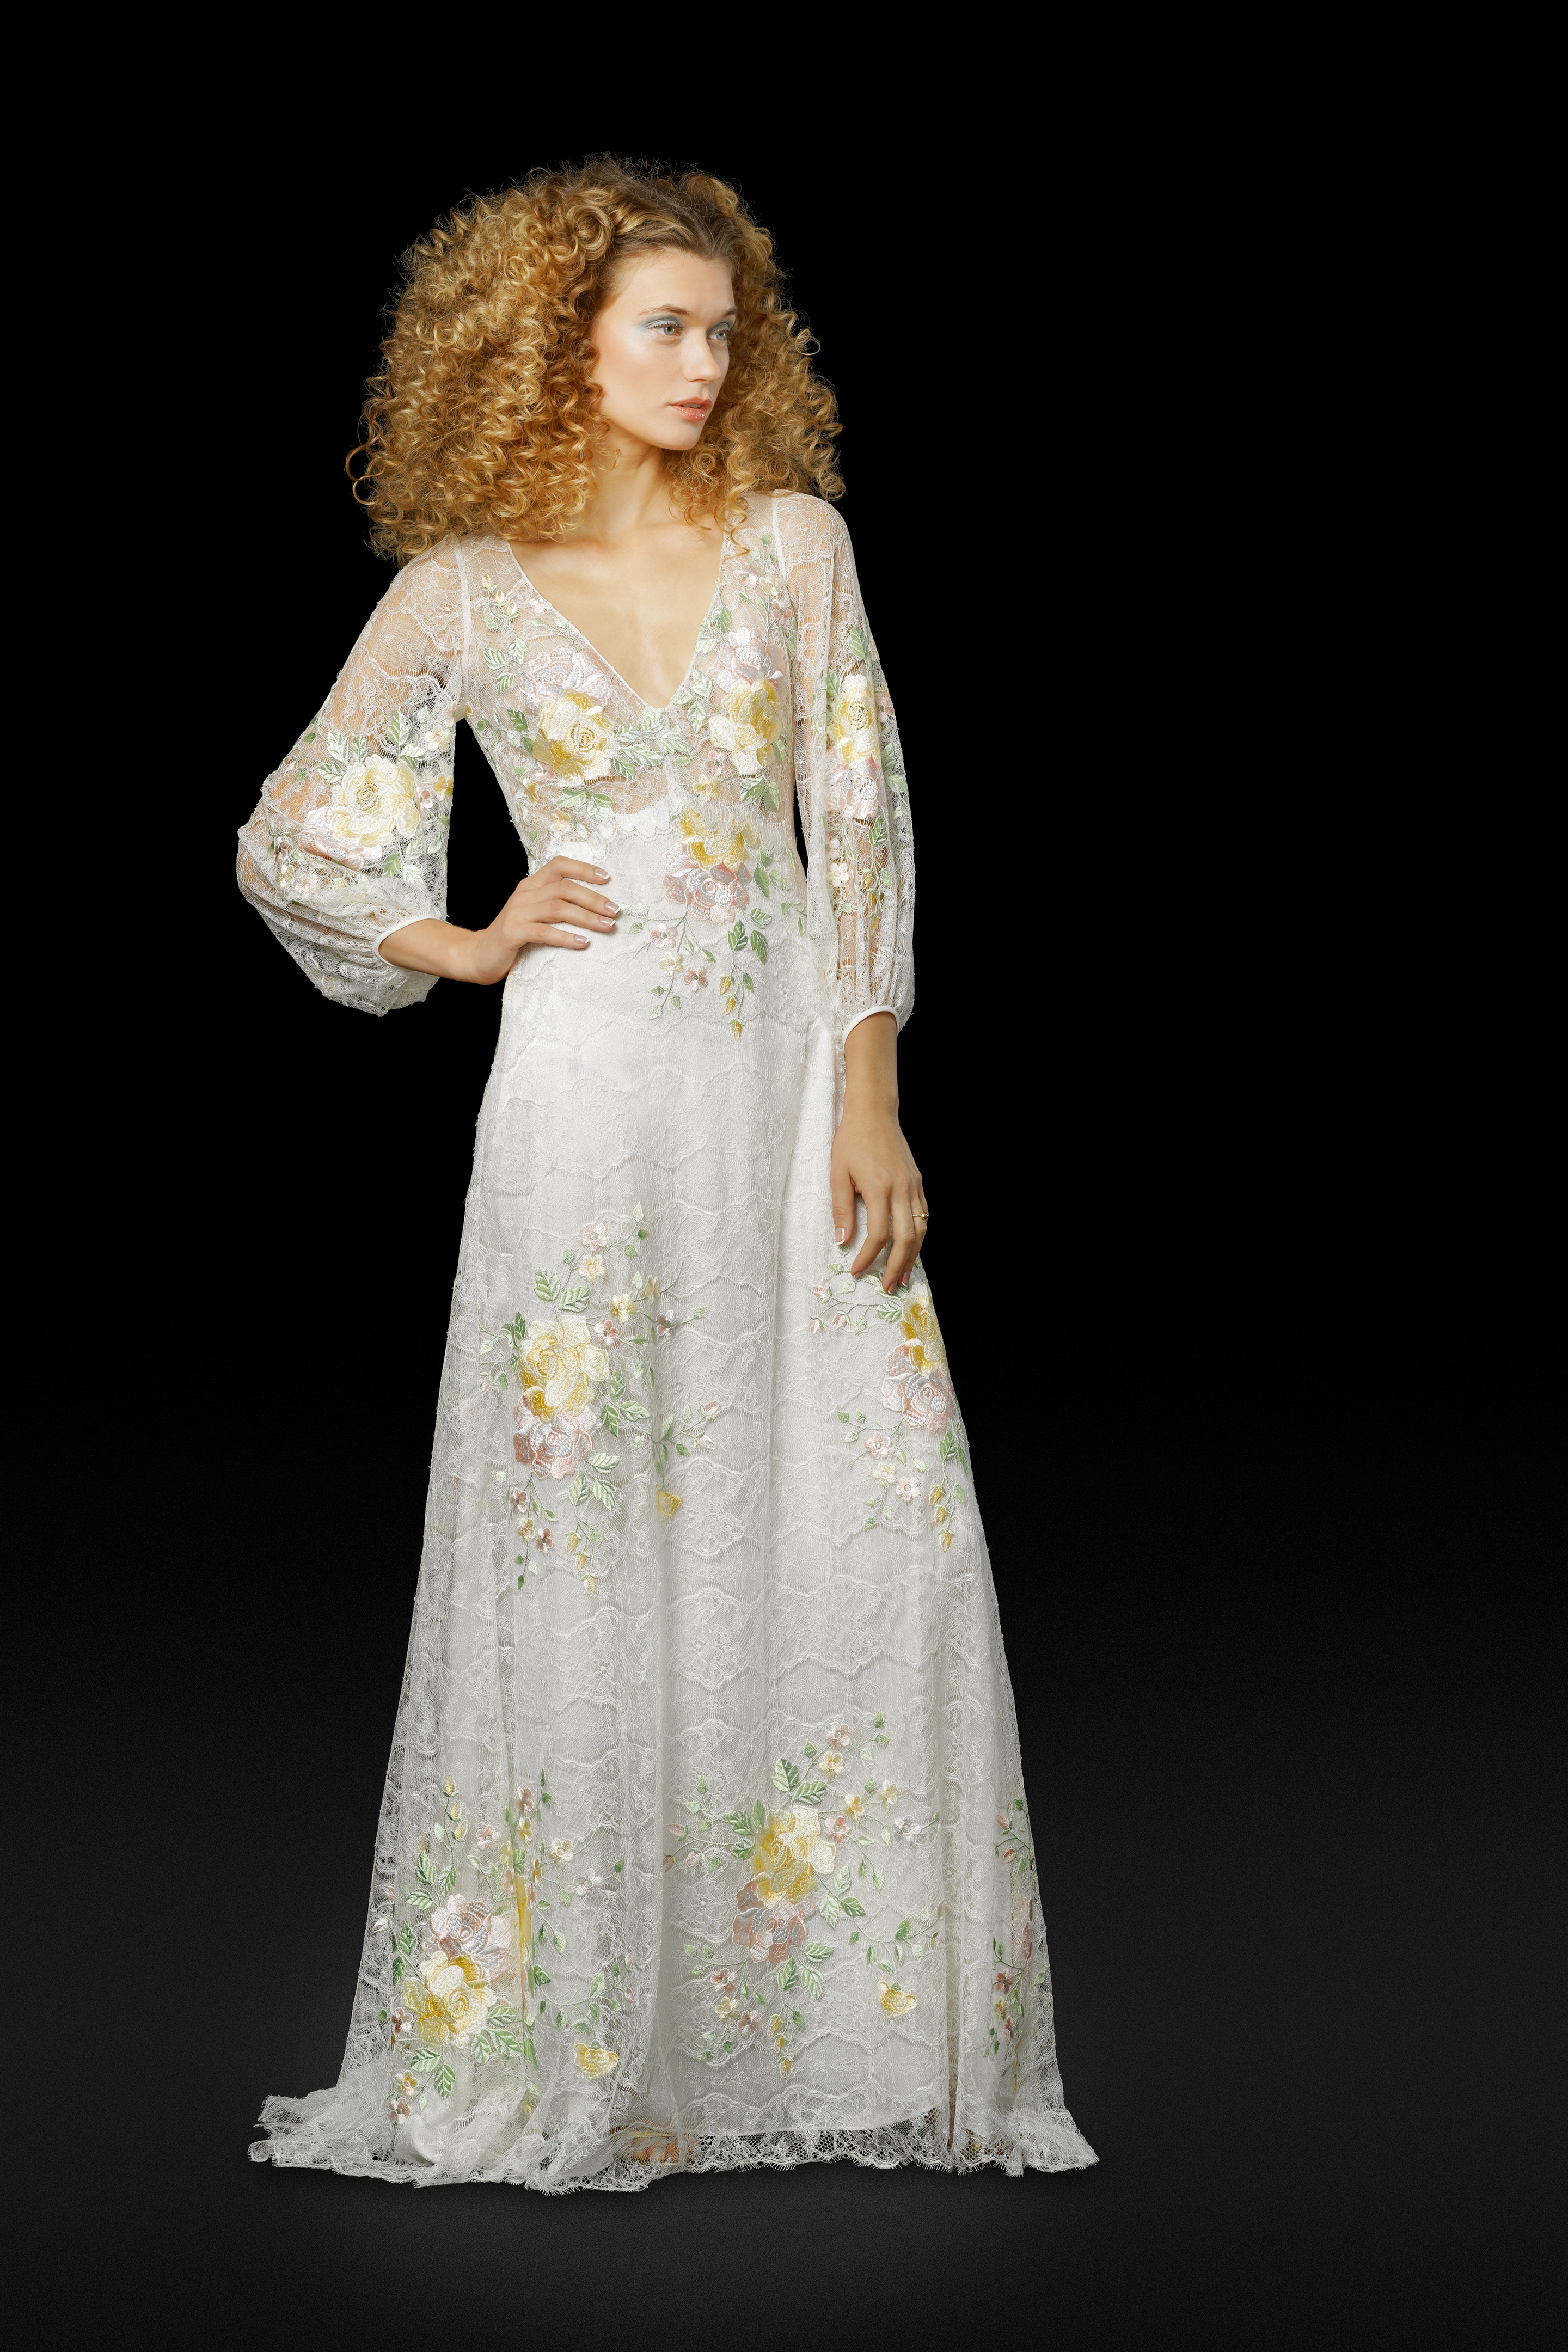 Elizabeth Fillmore Fall 2017 Wedding Dress Collection - Felicity